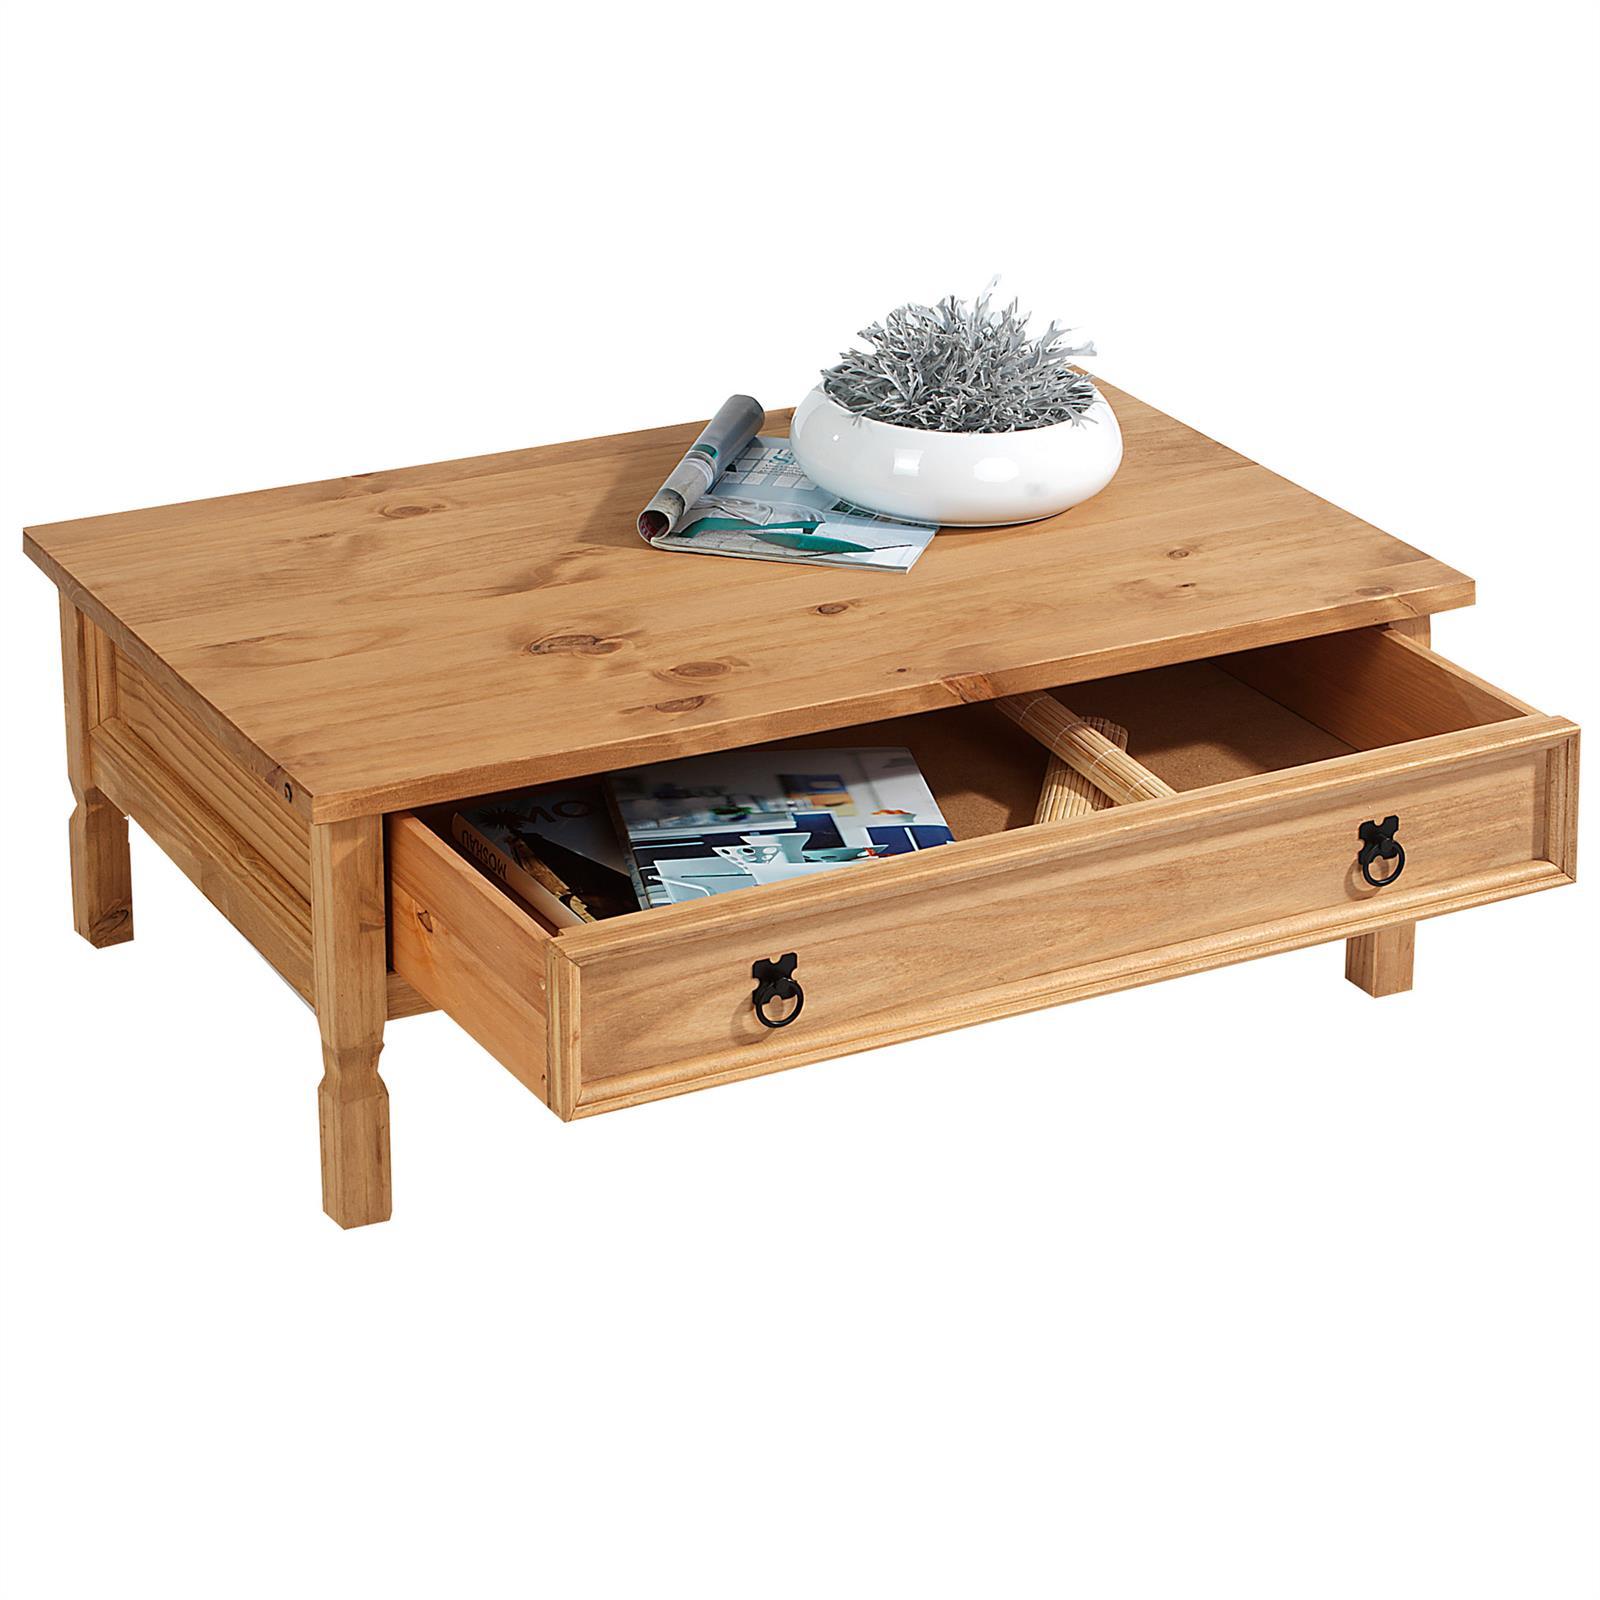 mexico m bel couchtisch tequila kiefer massiv mobilia24. Black Bedroom Furniture Sets. Home Design Ideas